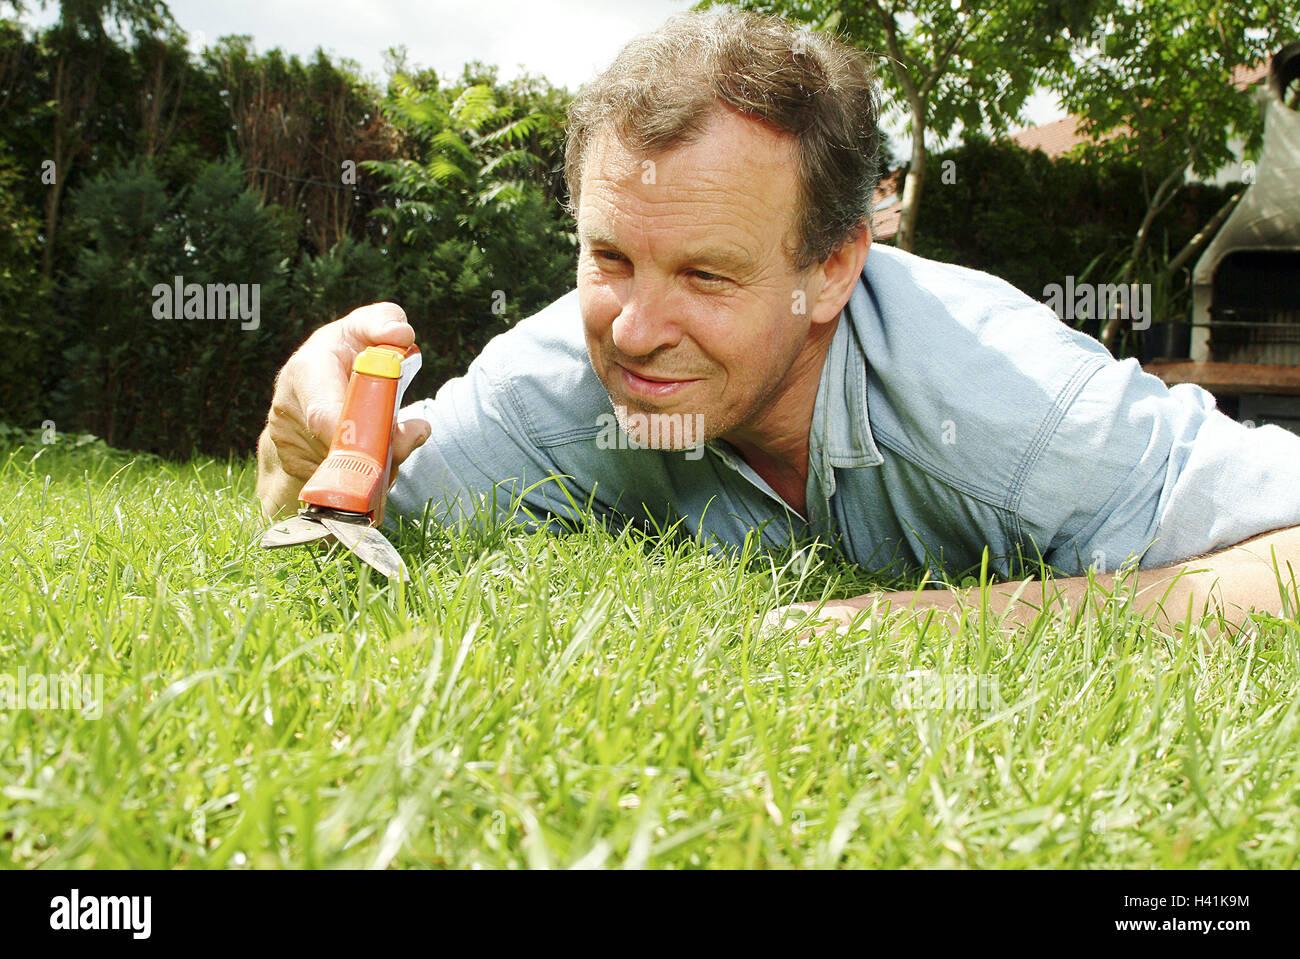 Turfs, man, lie, grass scissors, portrait, man's portrait, middle old person, 40-50 years, hobby, amateur gardener, - Stock Image